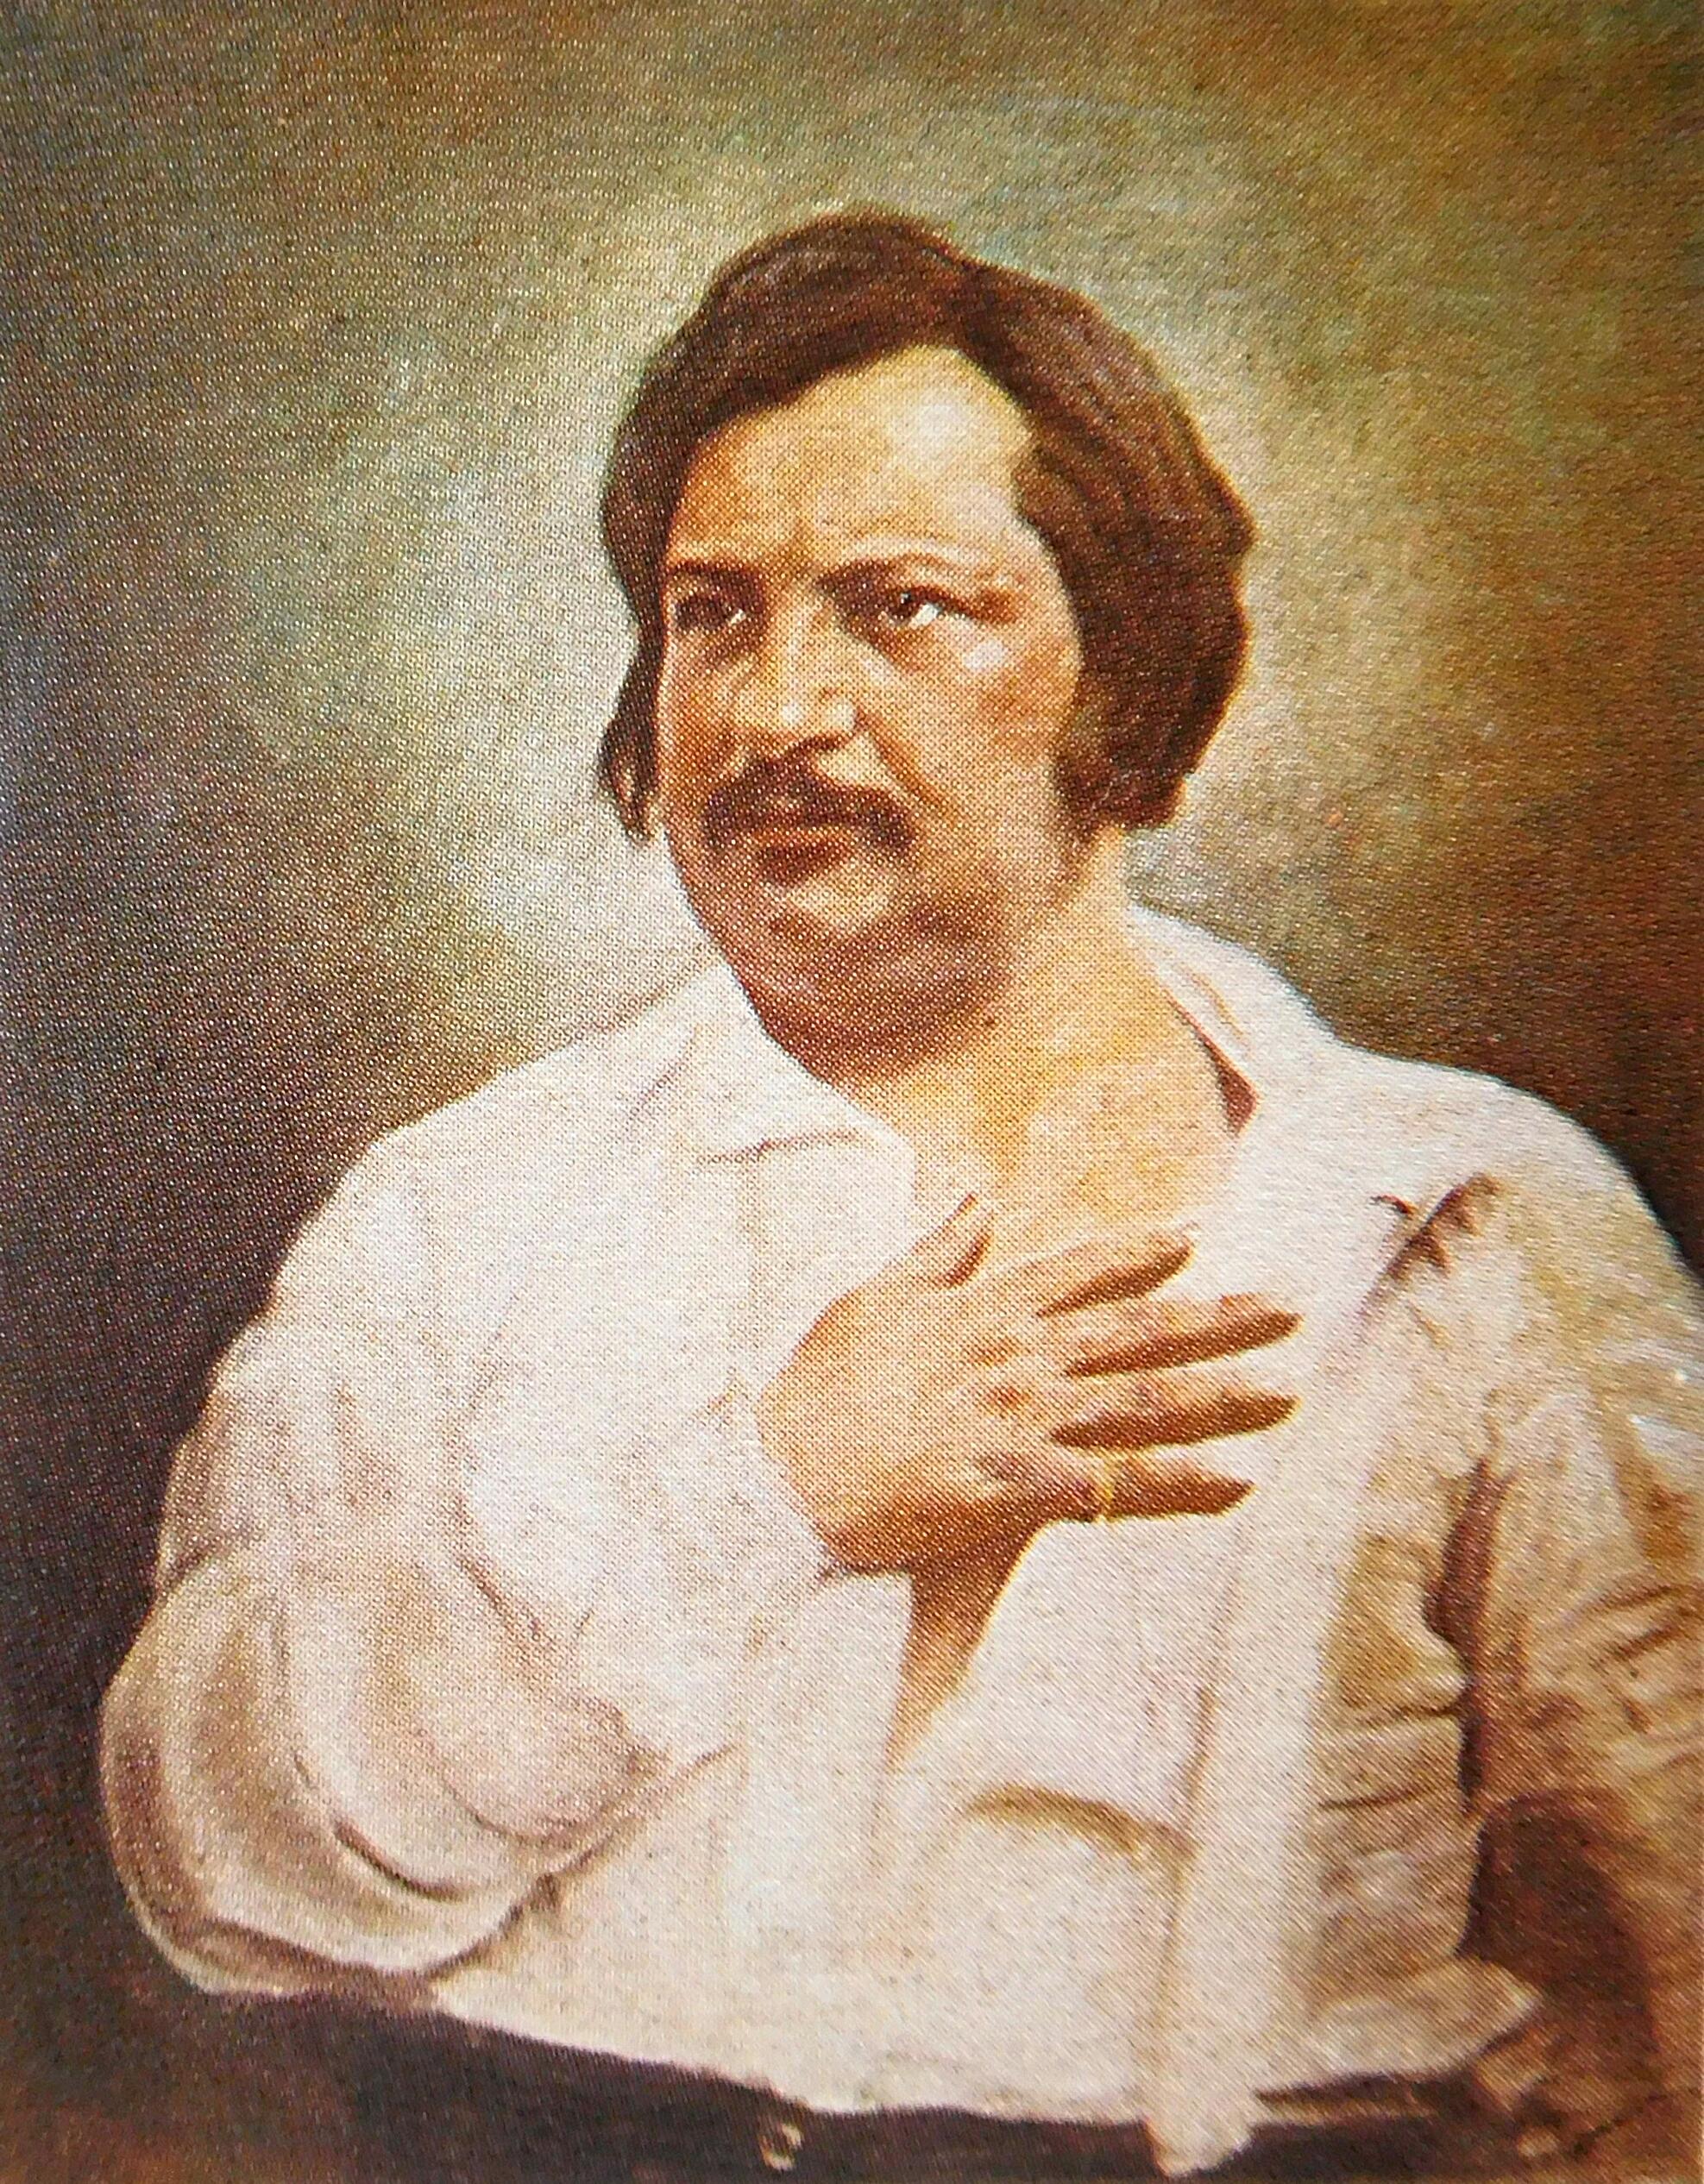 Photo Honoré de Balzac via Opendata BNF